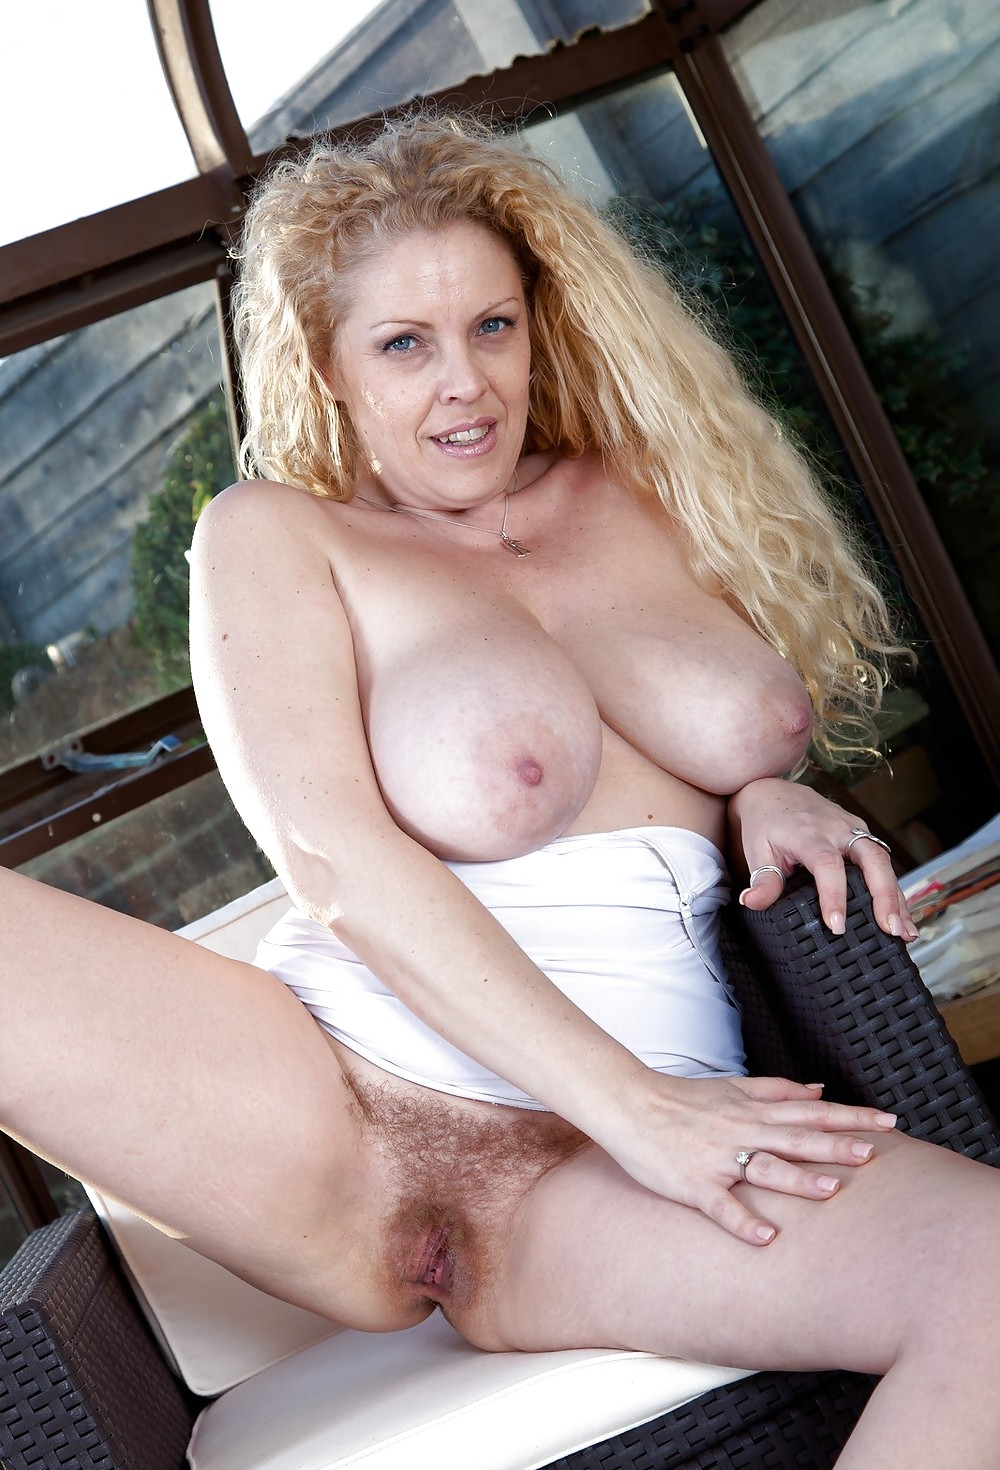 Mature Blonde Big Naturals Hairy